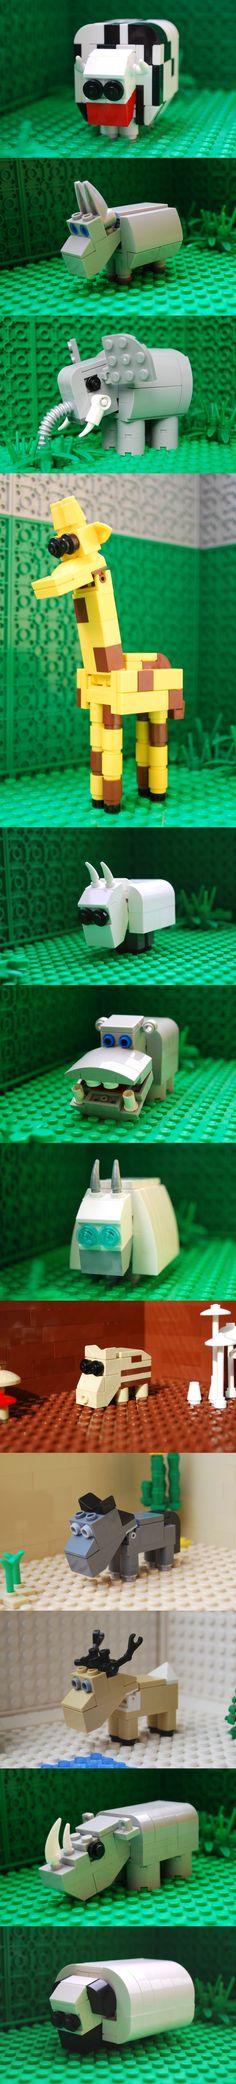 LEGO Animals: cow, donkey, elephant, giraffe, goat, hippo, mountain-goat, piglet, pony, reindeer, rhino, sheep #LEGO